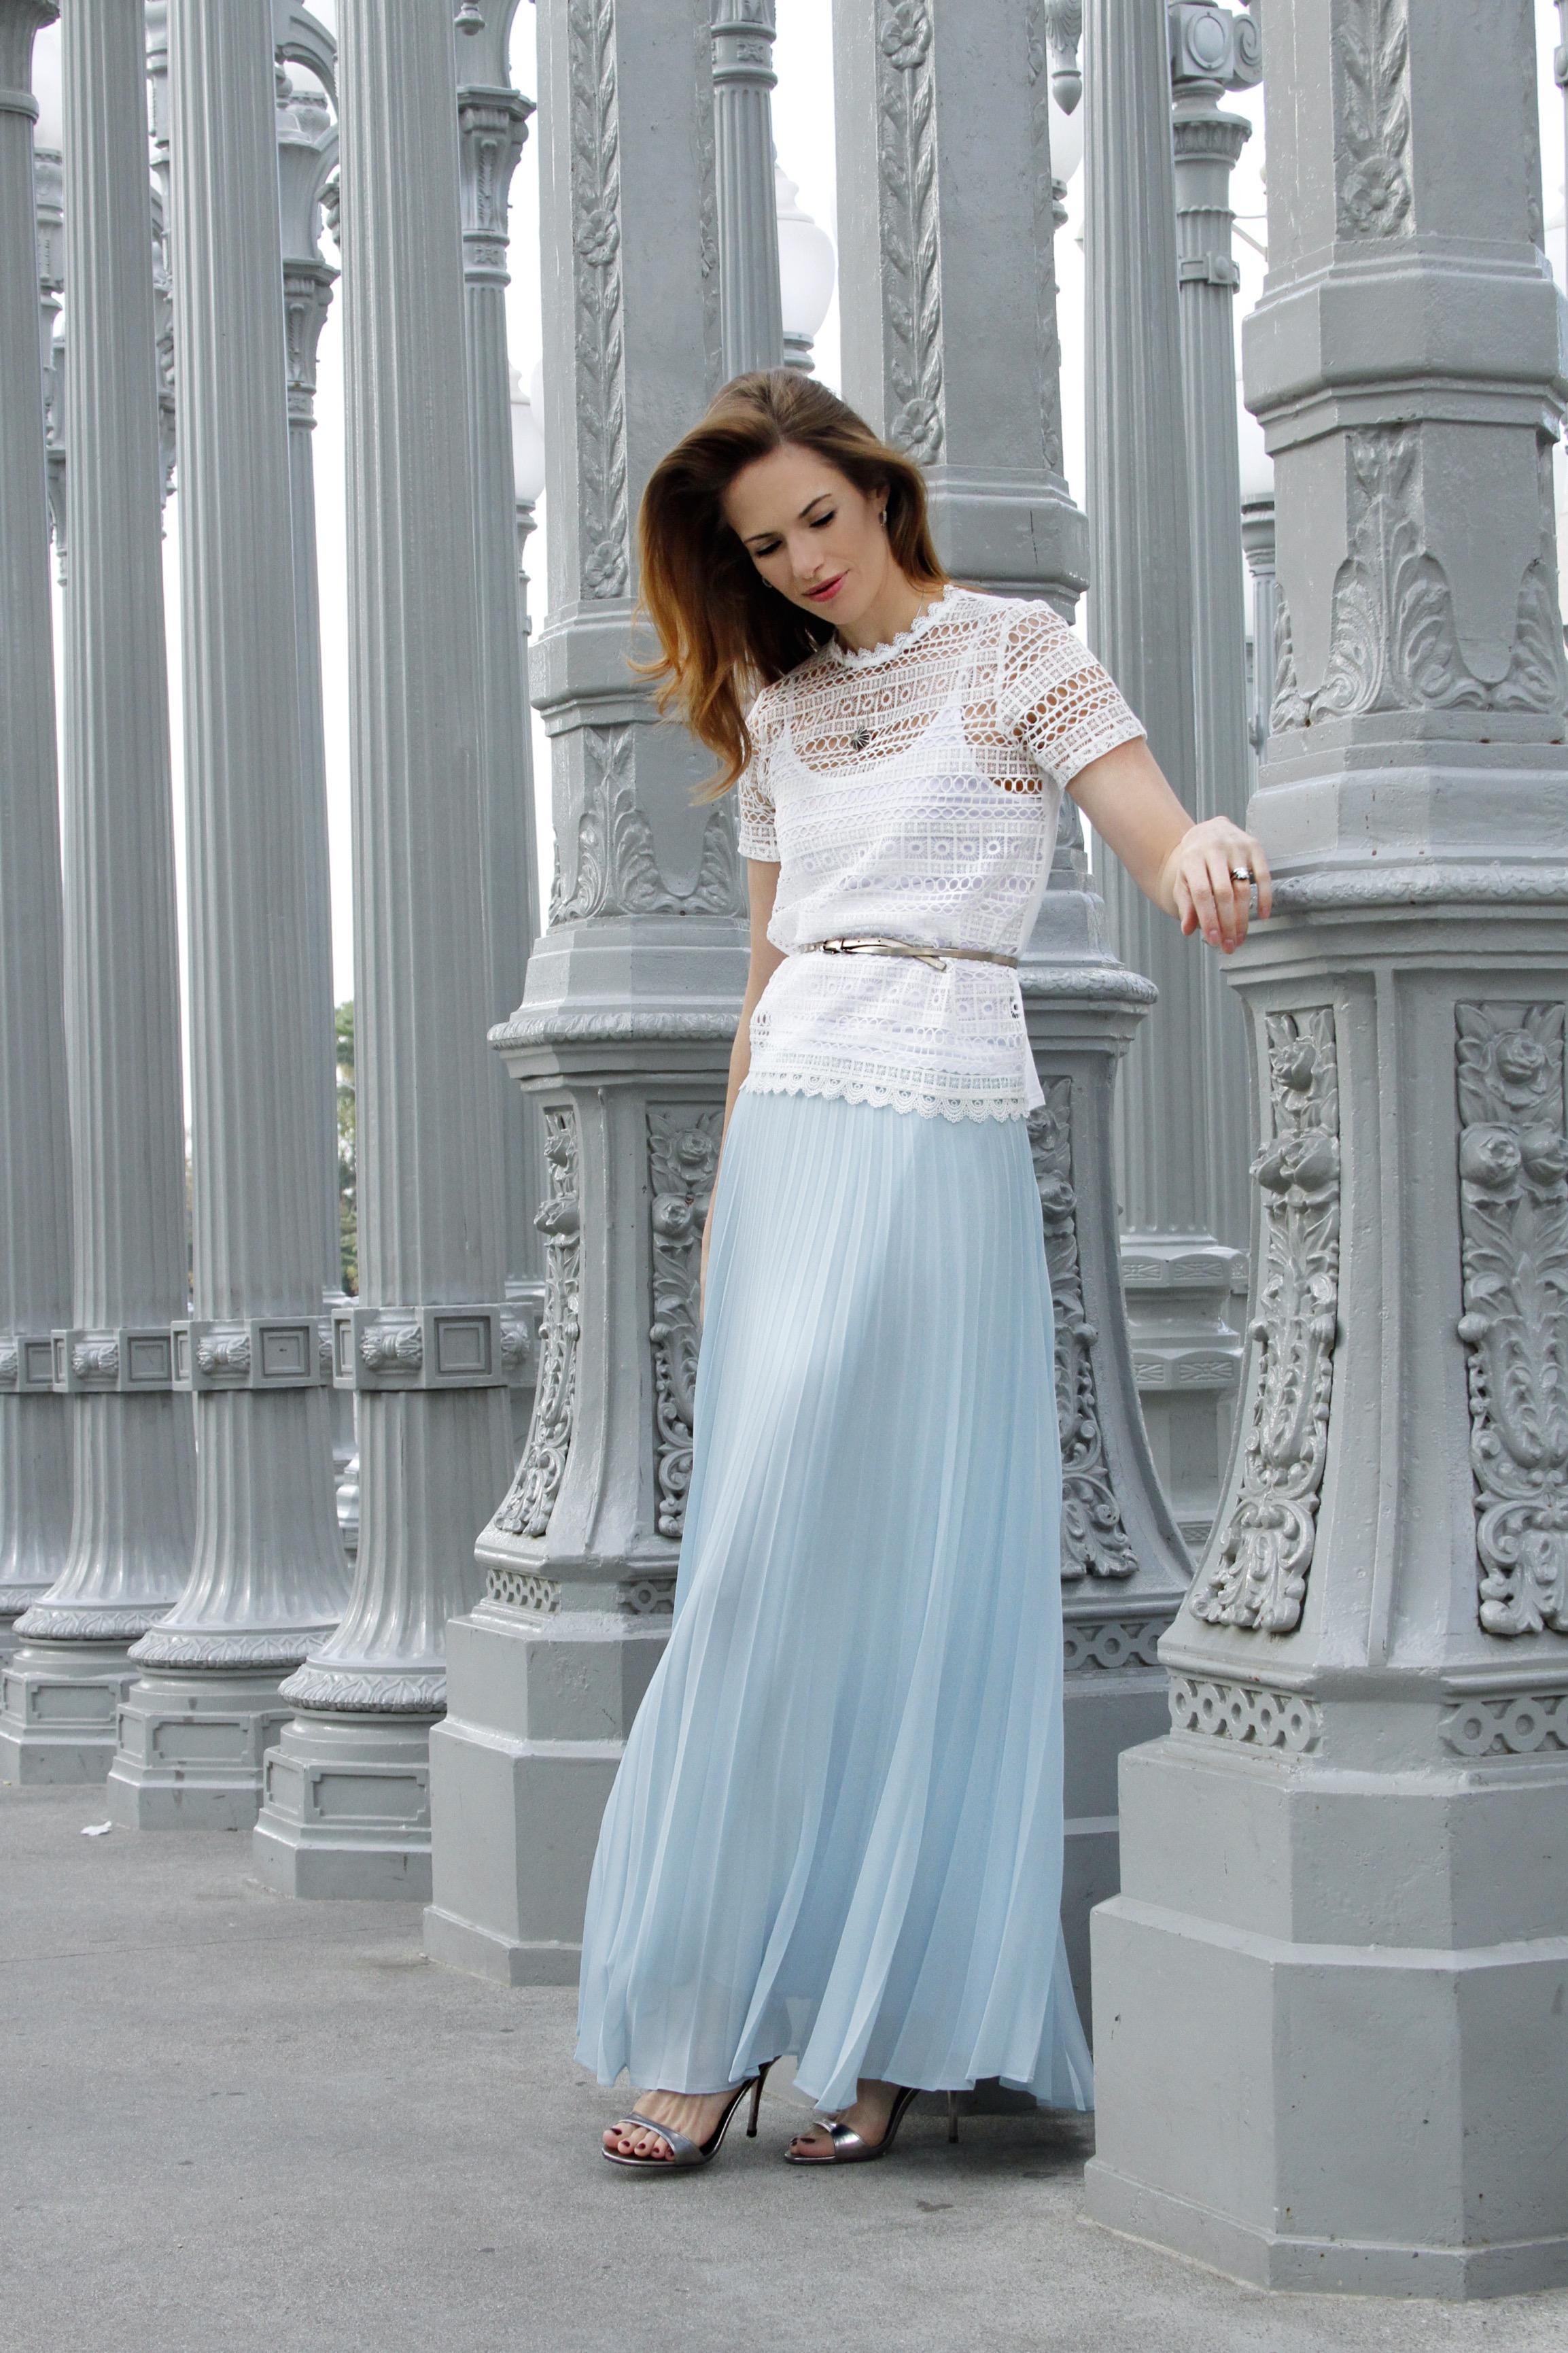 Top ,  Skirt ,  Shoes ,  similar belt